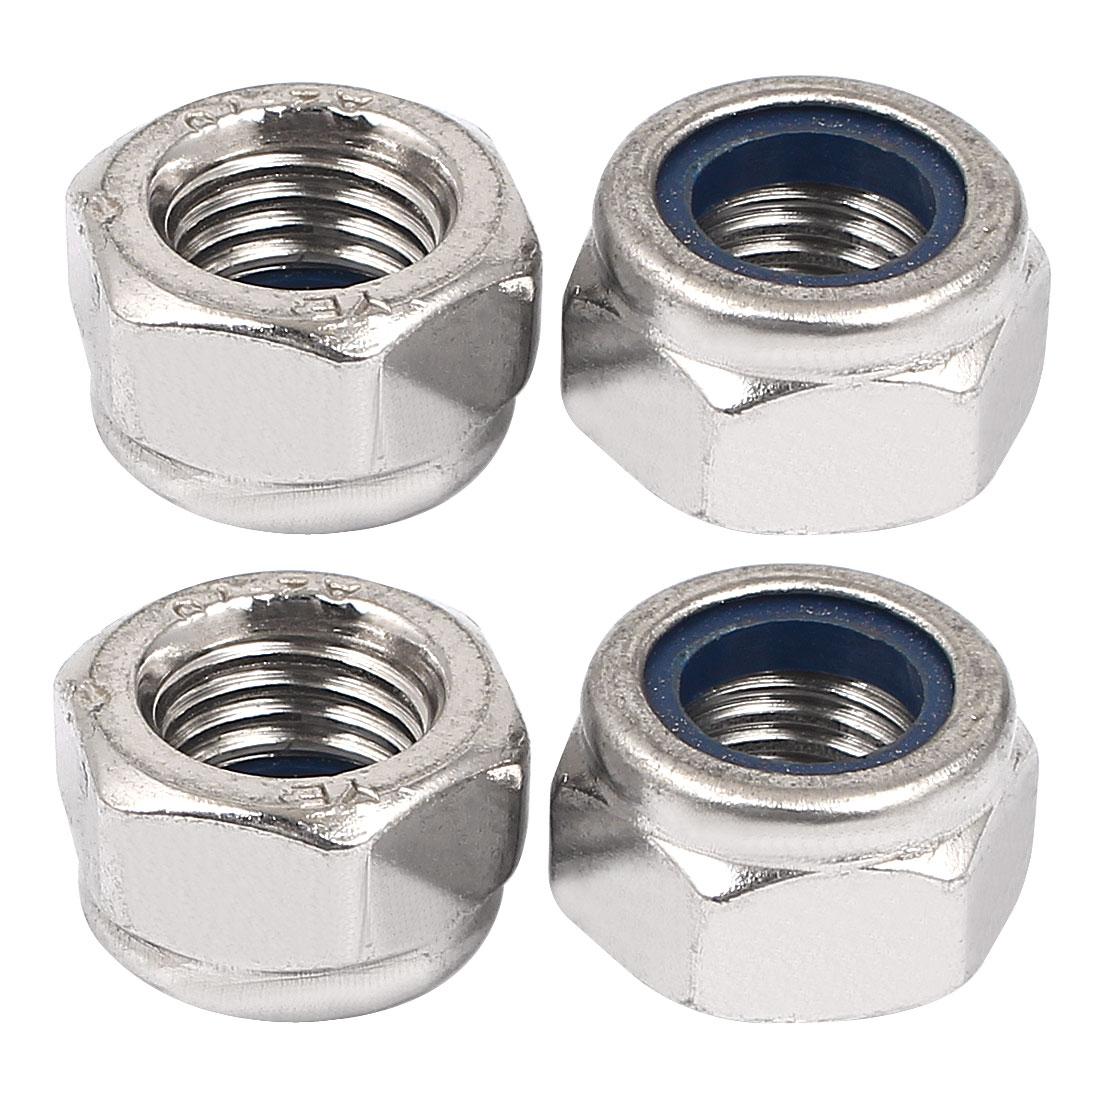 Unique Bargains M12 Thread 1.5mm Pitch Nylock Self-Locking Nylon Insert Hex Lock Nuts 4pcs